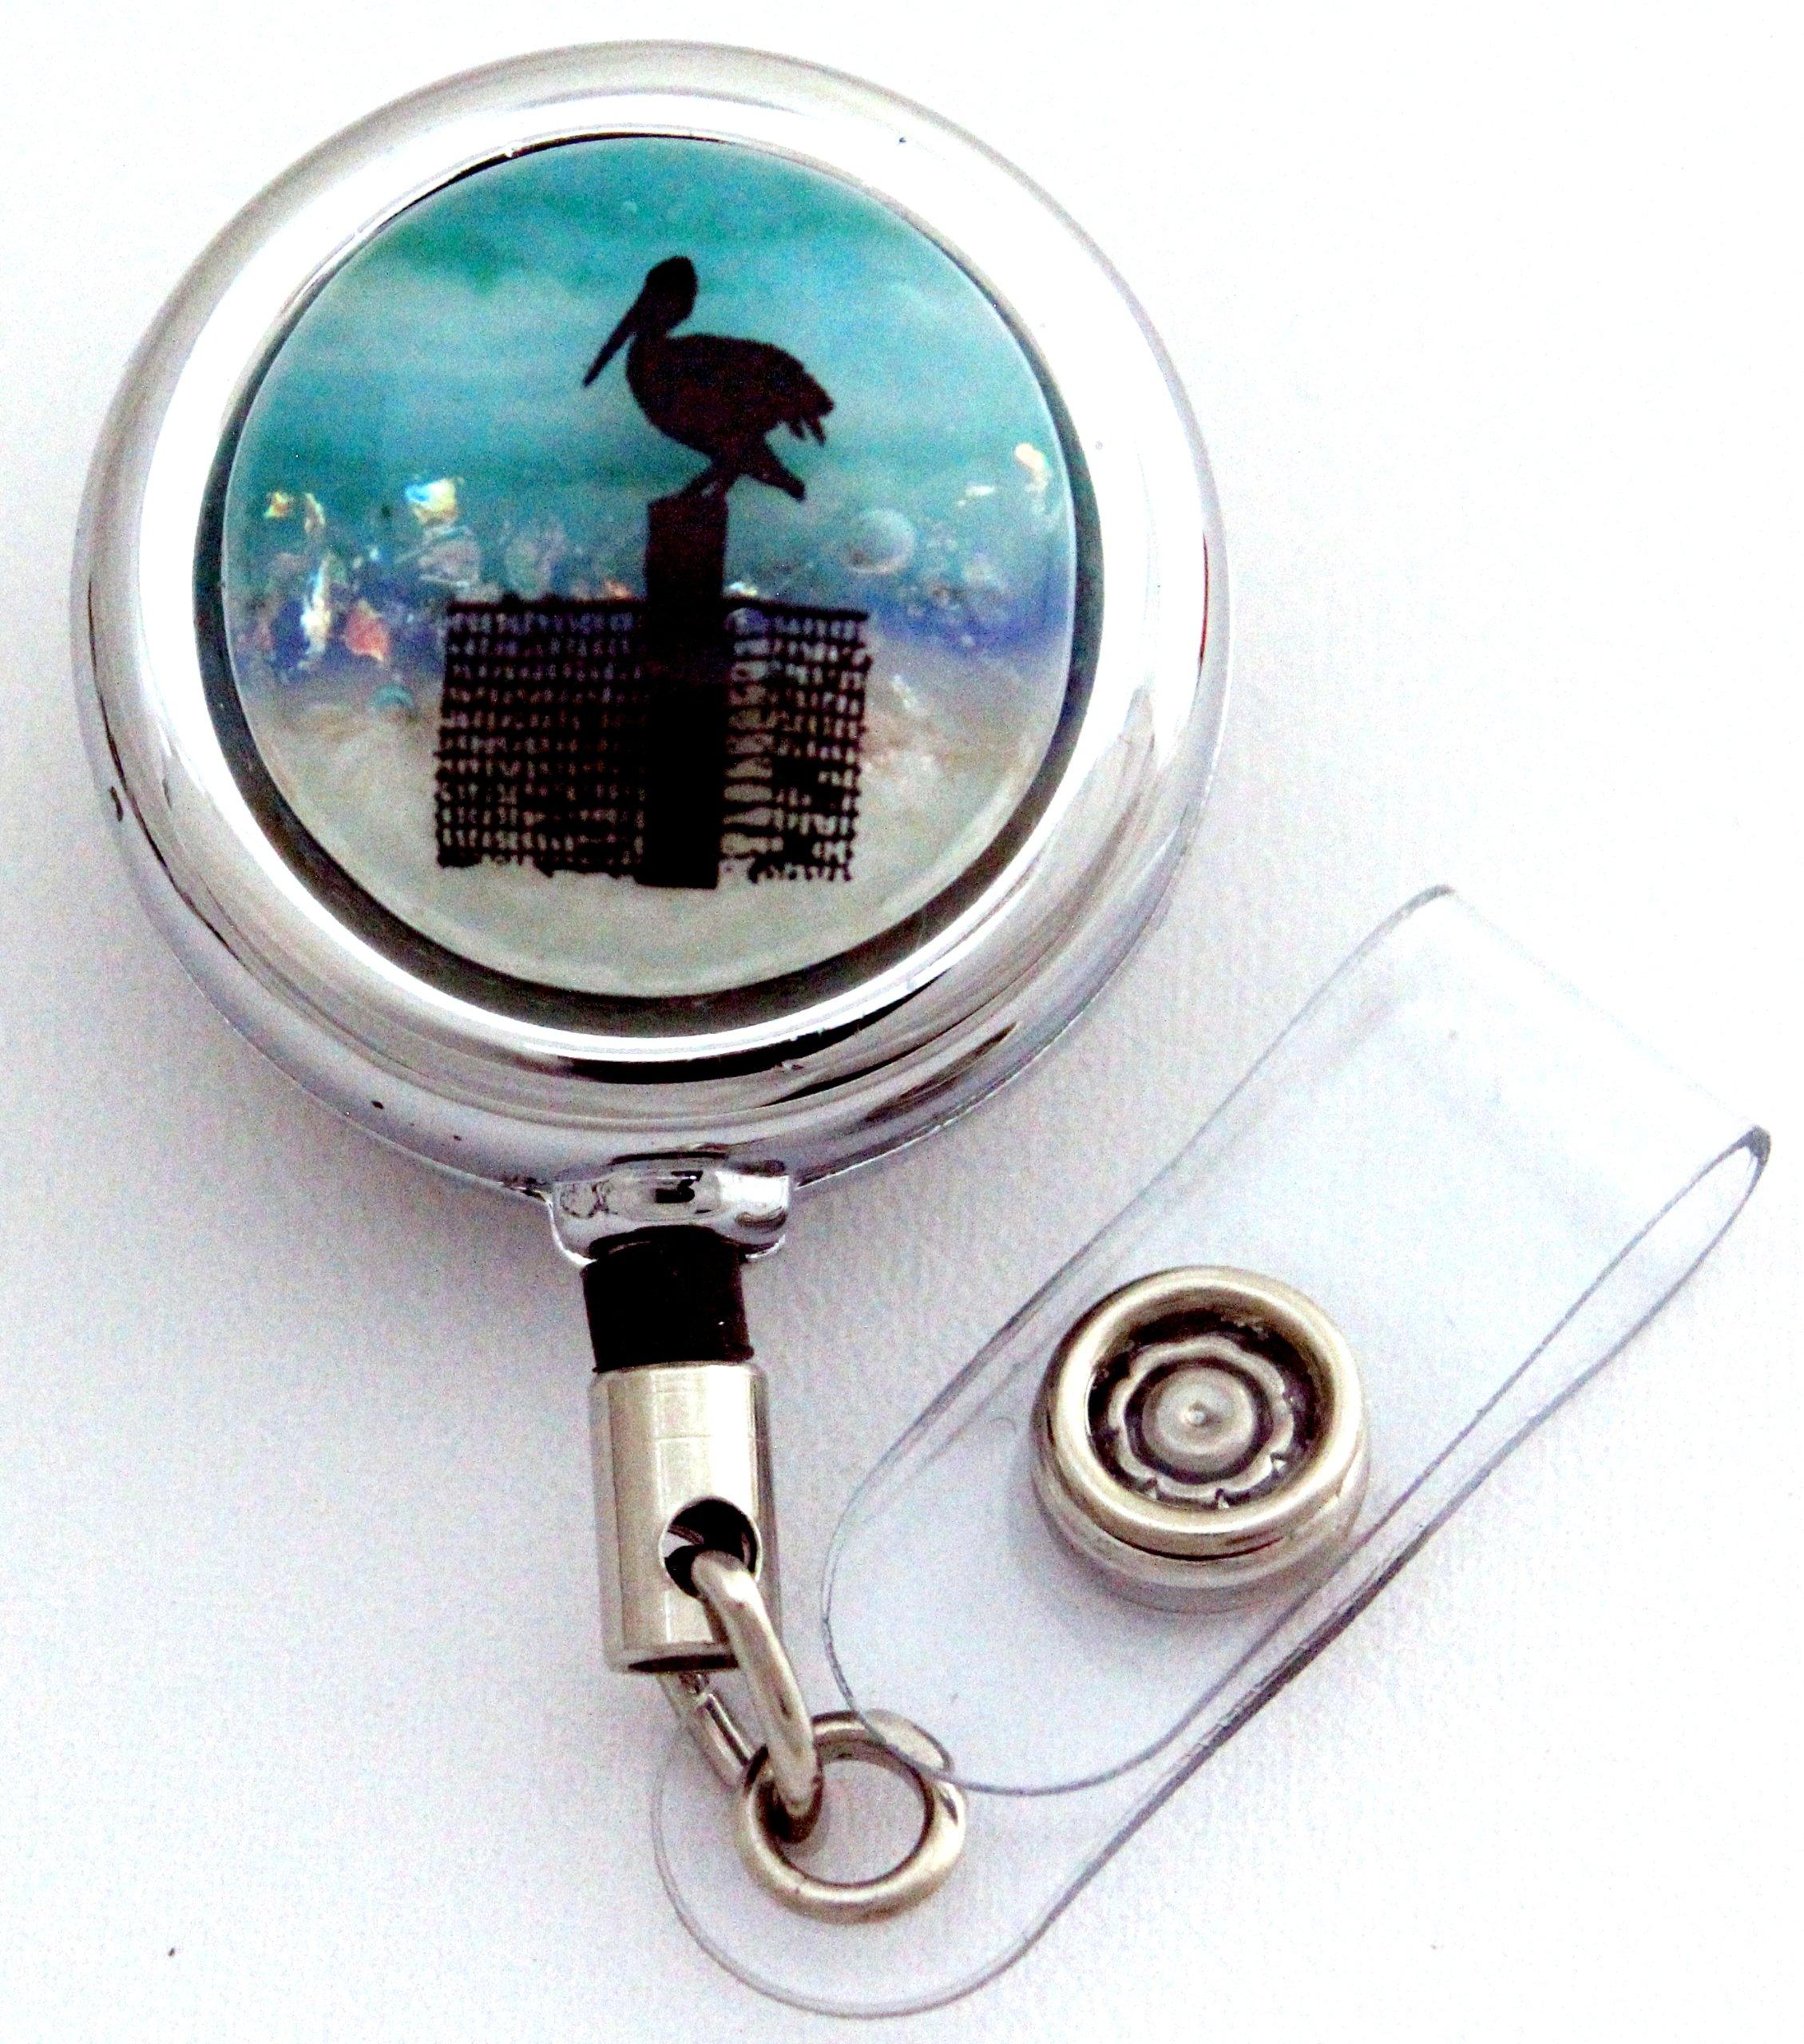 Pelican, Fused Glass, Metal Retractable Badge Reel with Belt Clip